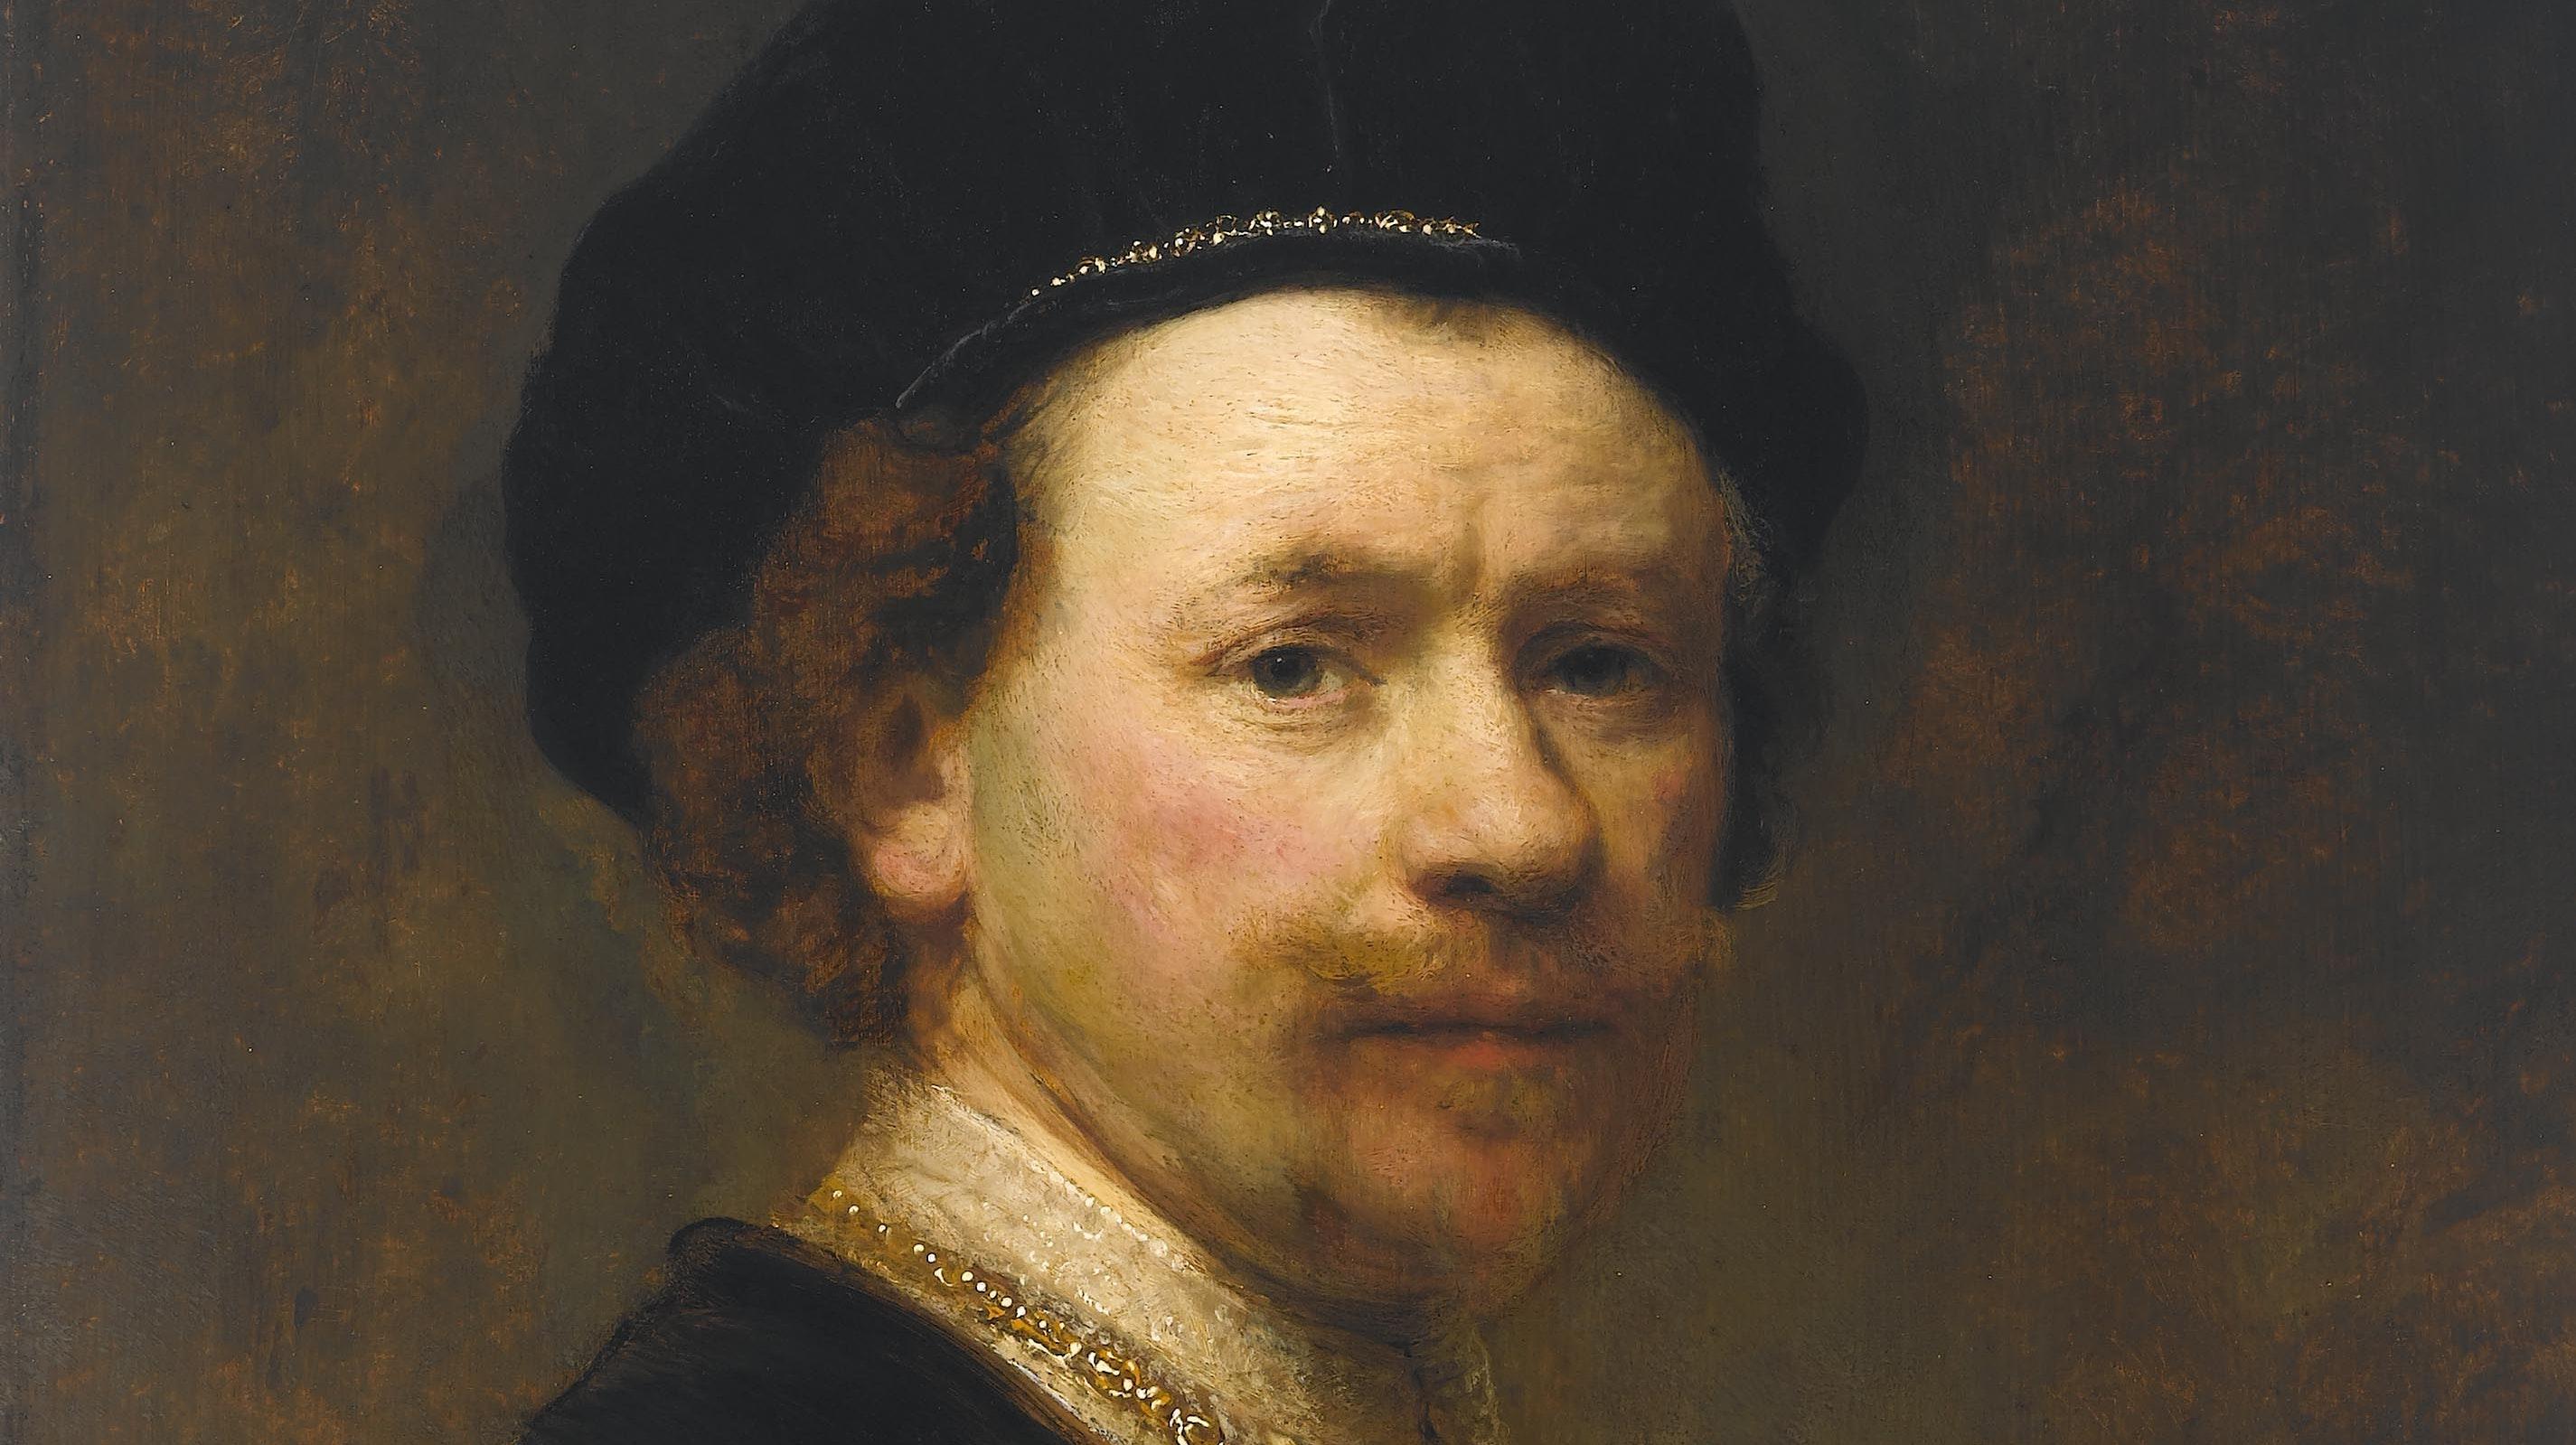 Rembrandt Harmenszoon van Rijn. Self-Portrait, about 1636–38. The Norton Simon Foundation, Pasadena, California.